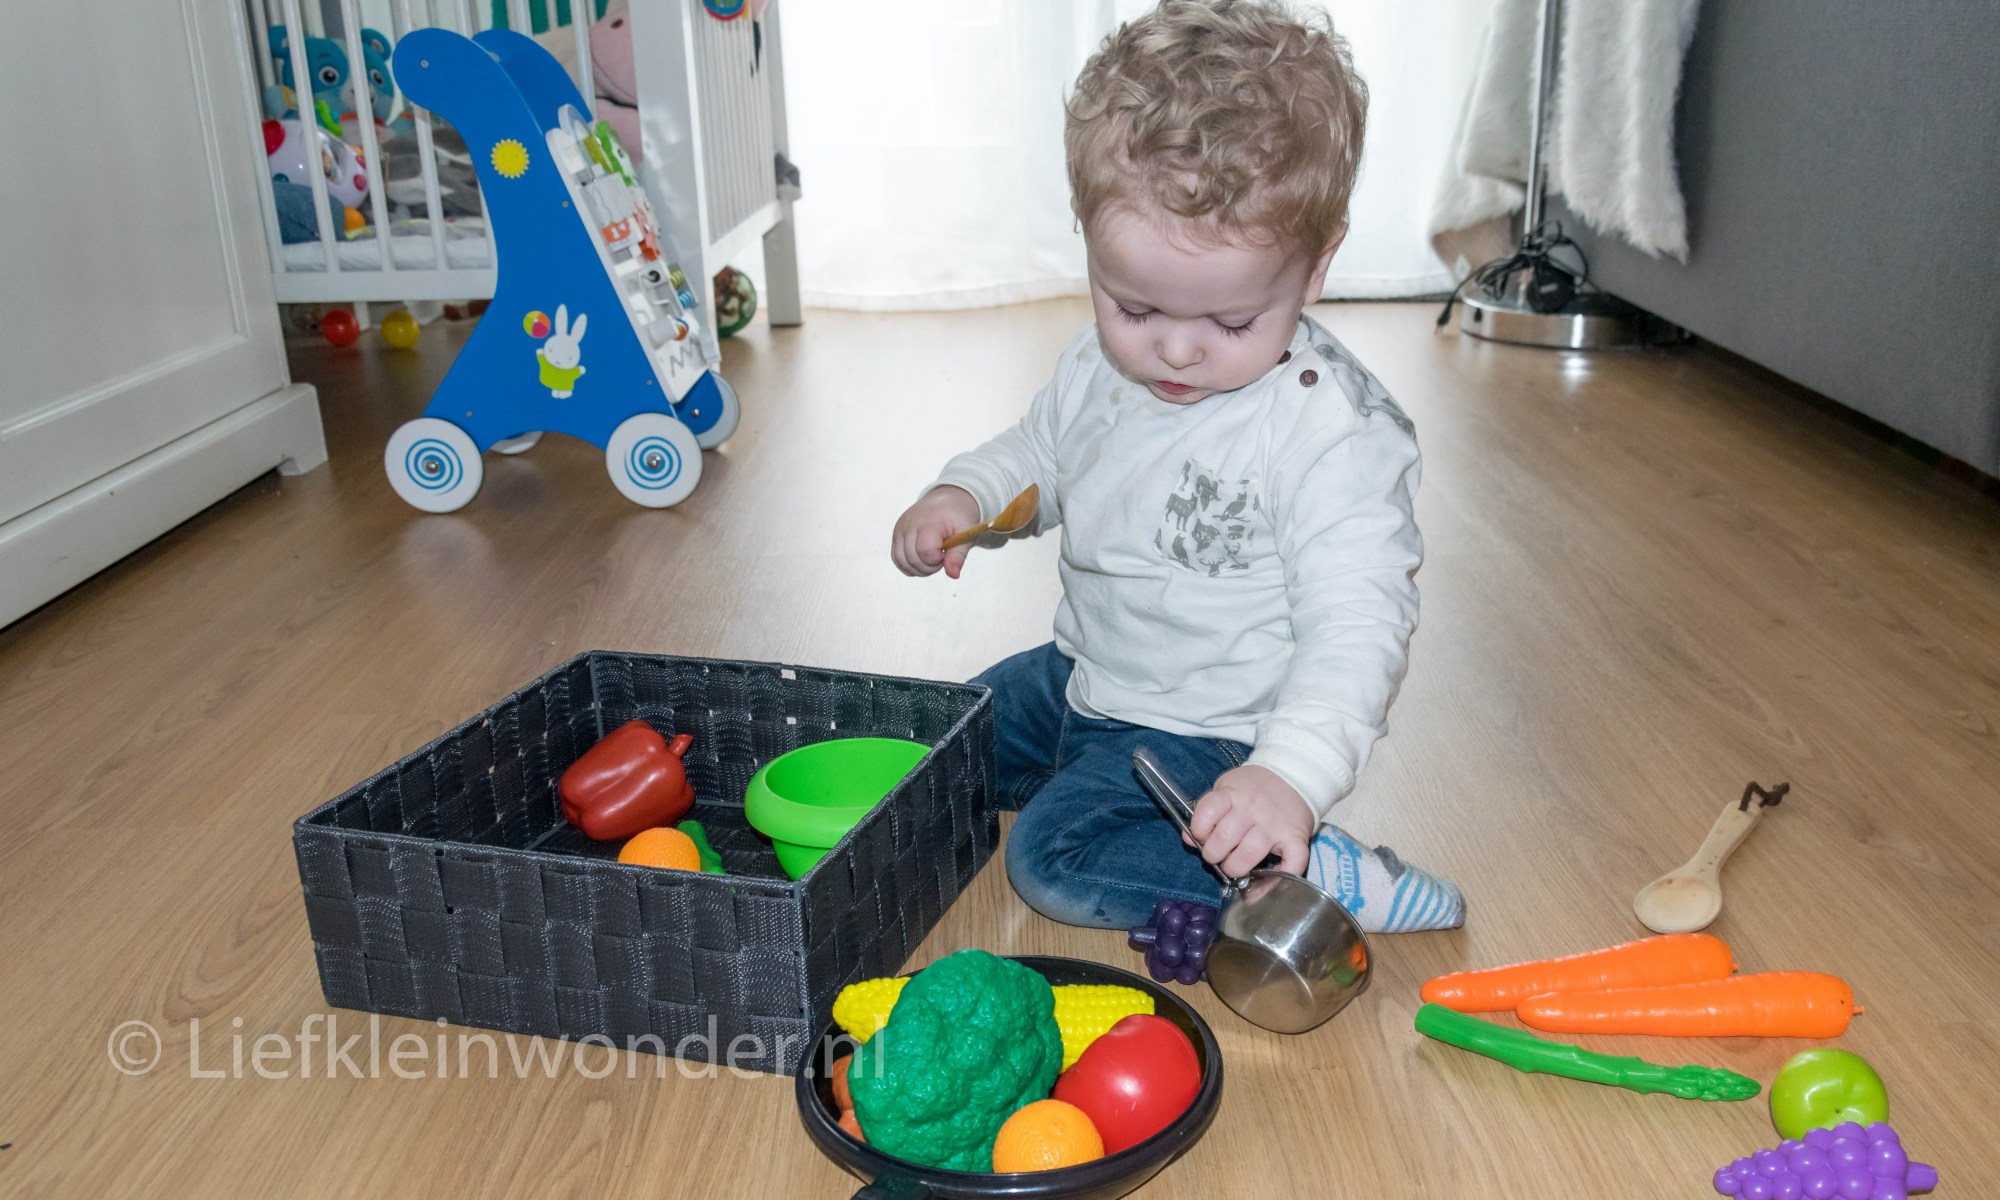 14 maanden en 1 week oud - speelgoed kook spullen groente en fruit